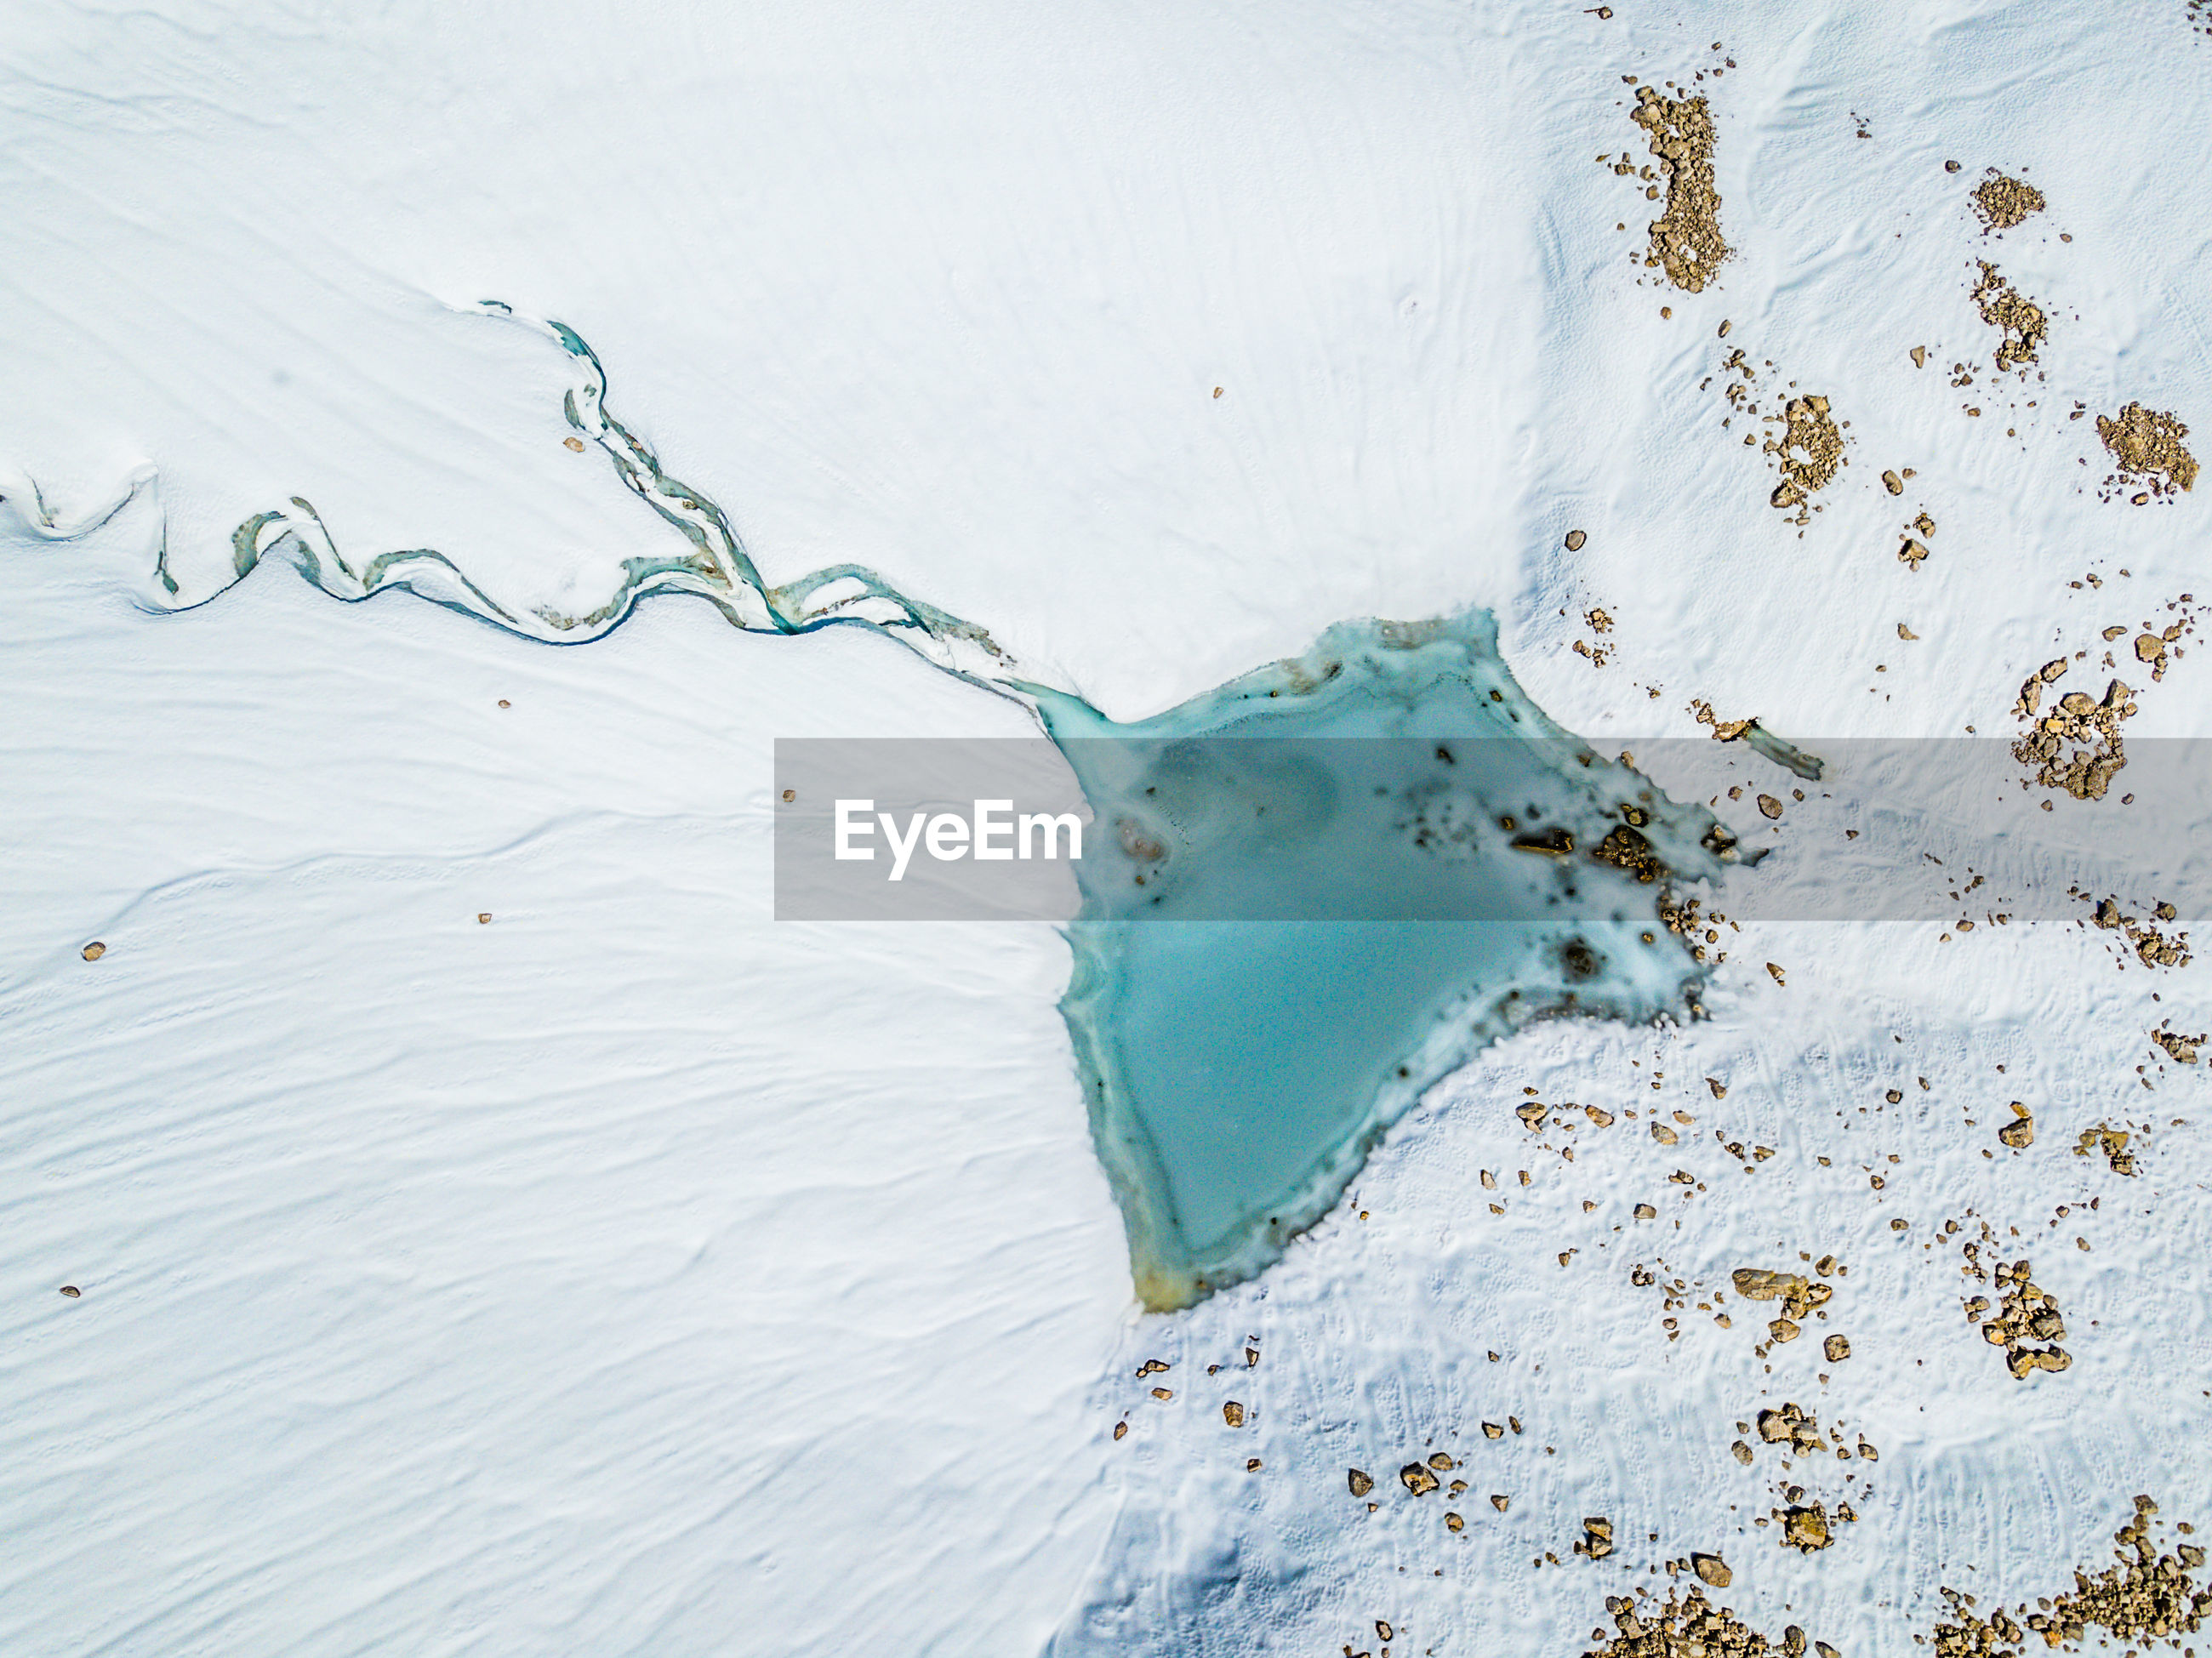 Aerial view of glacial lake